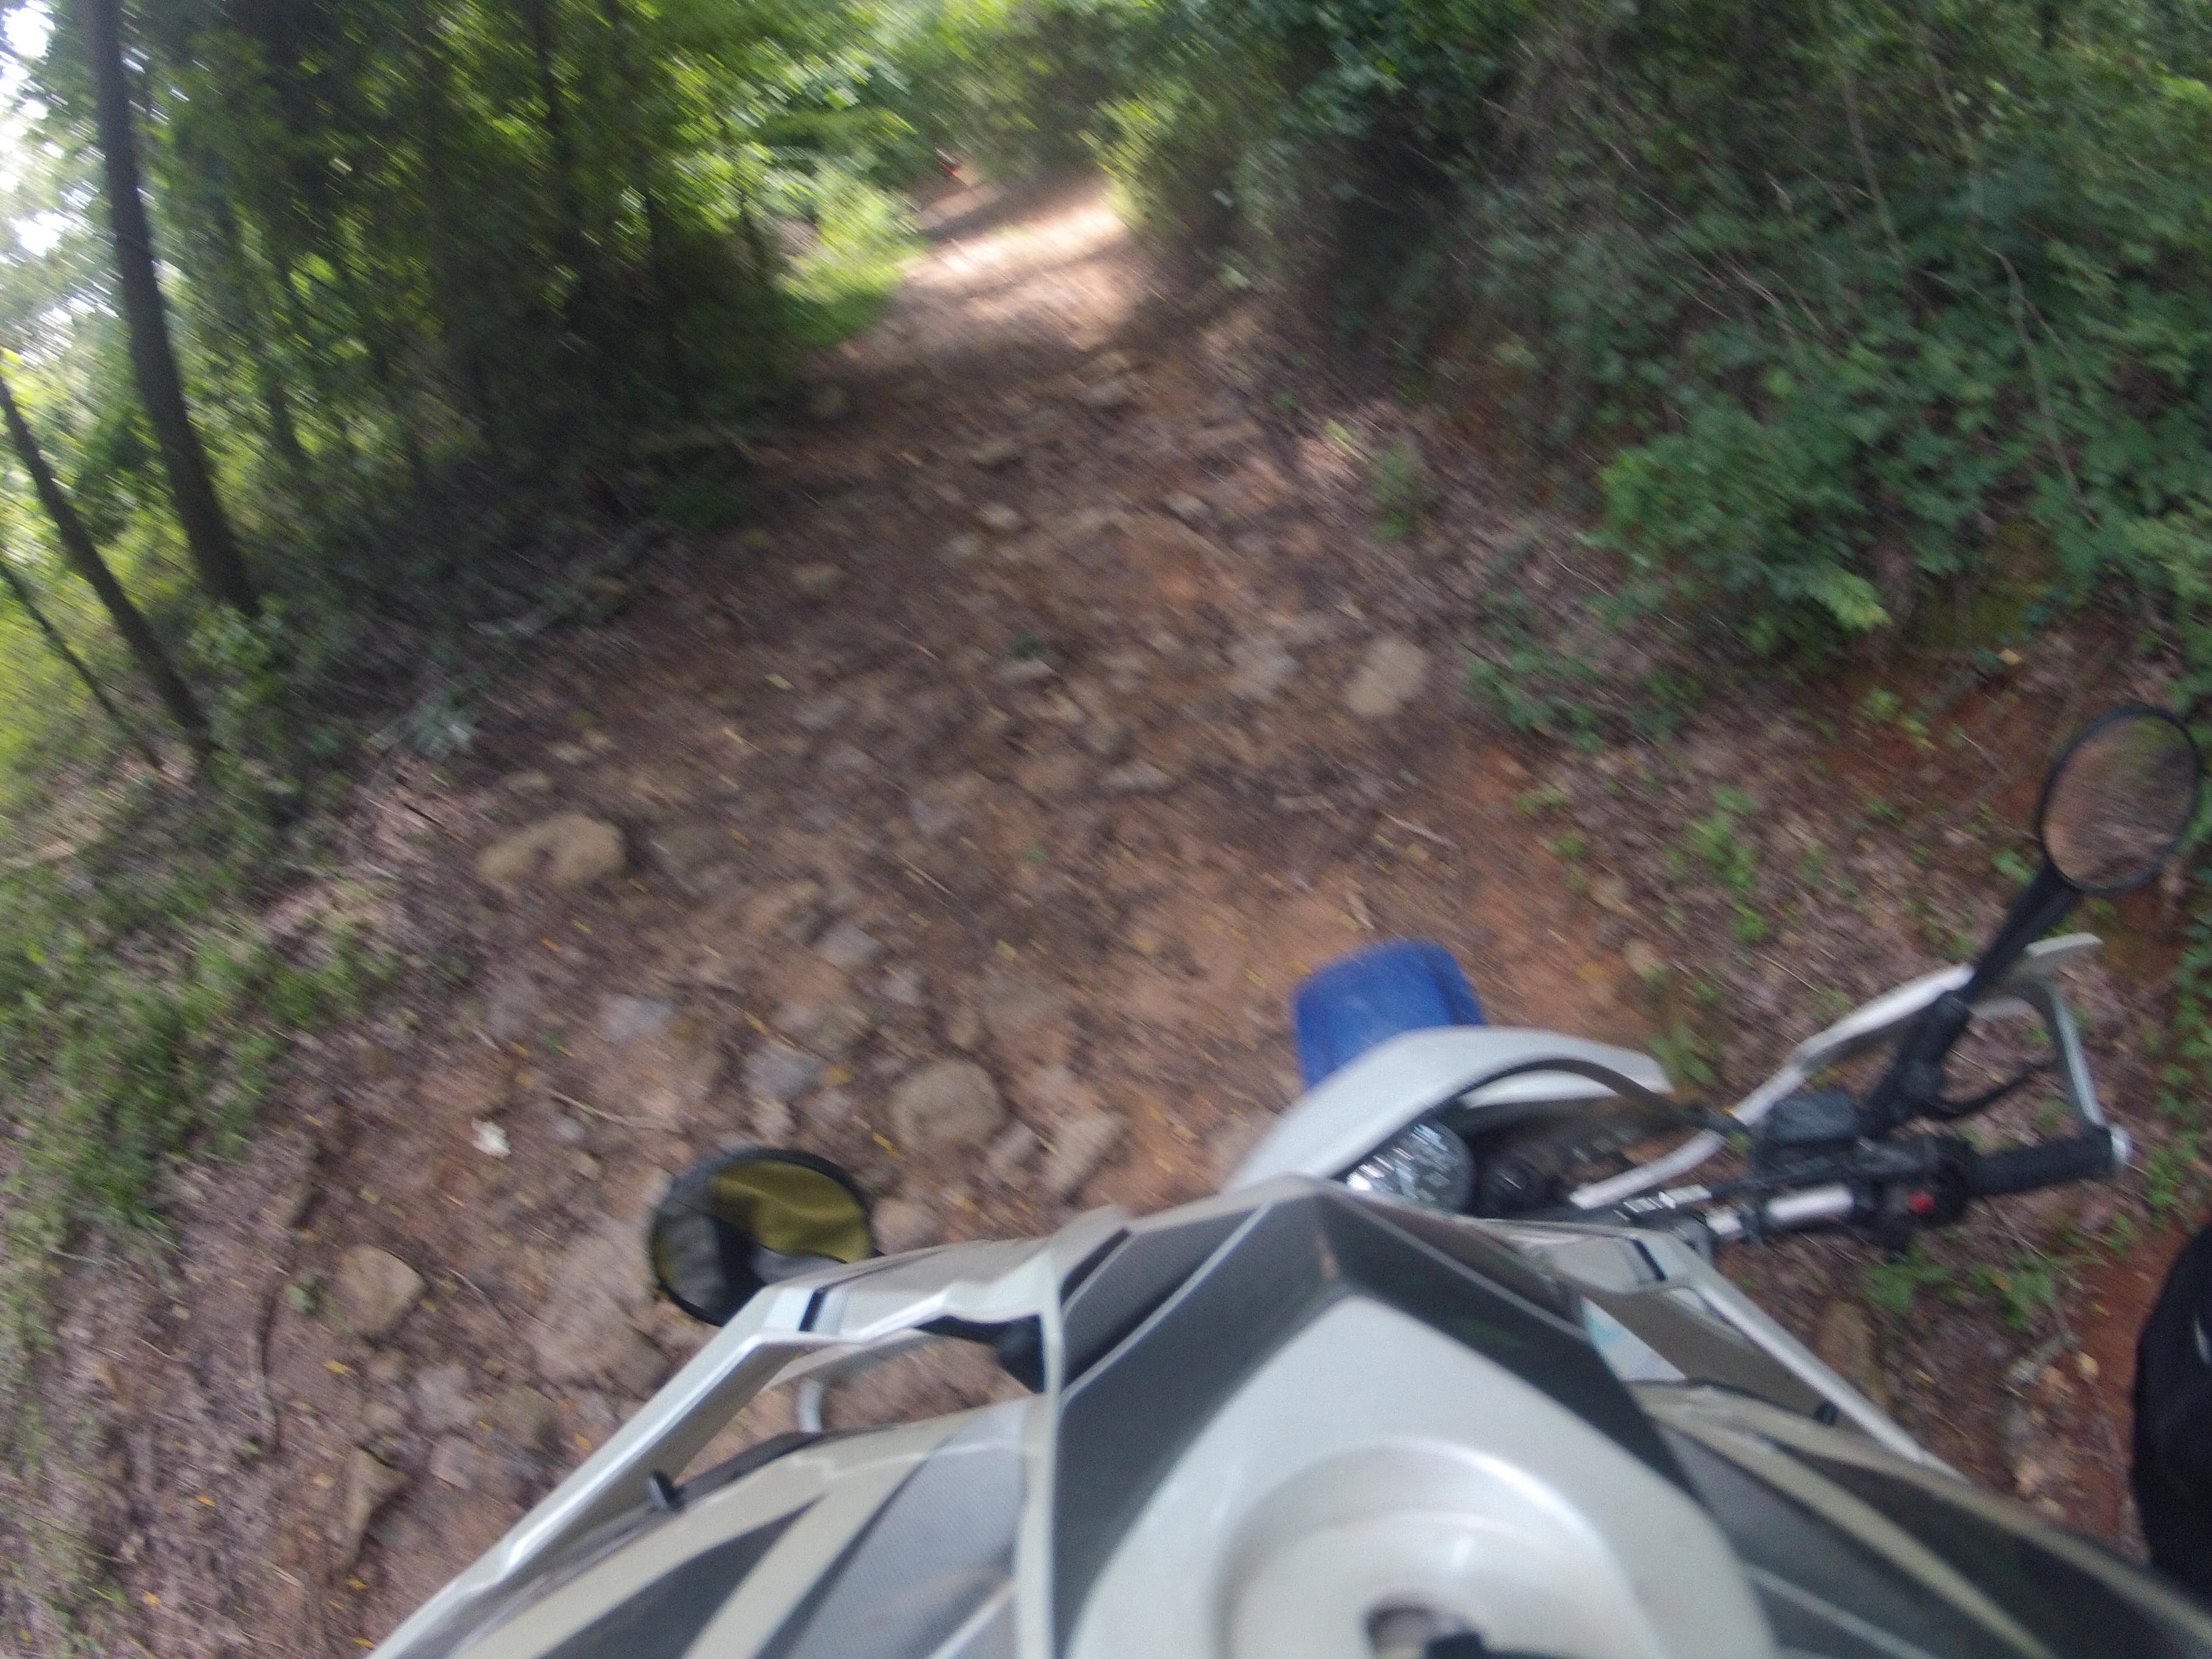 steep, rocky downhill